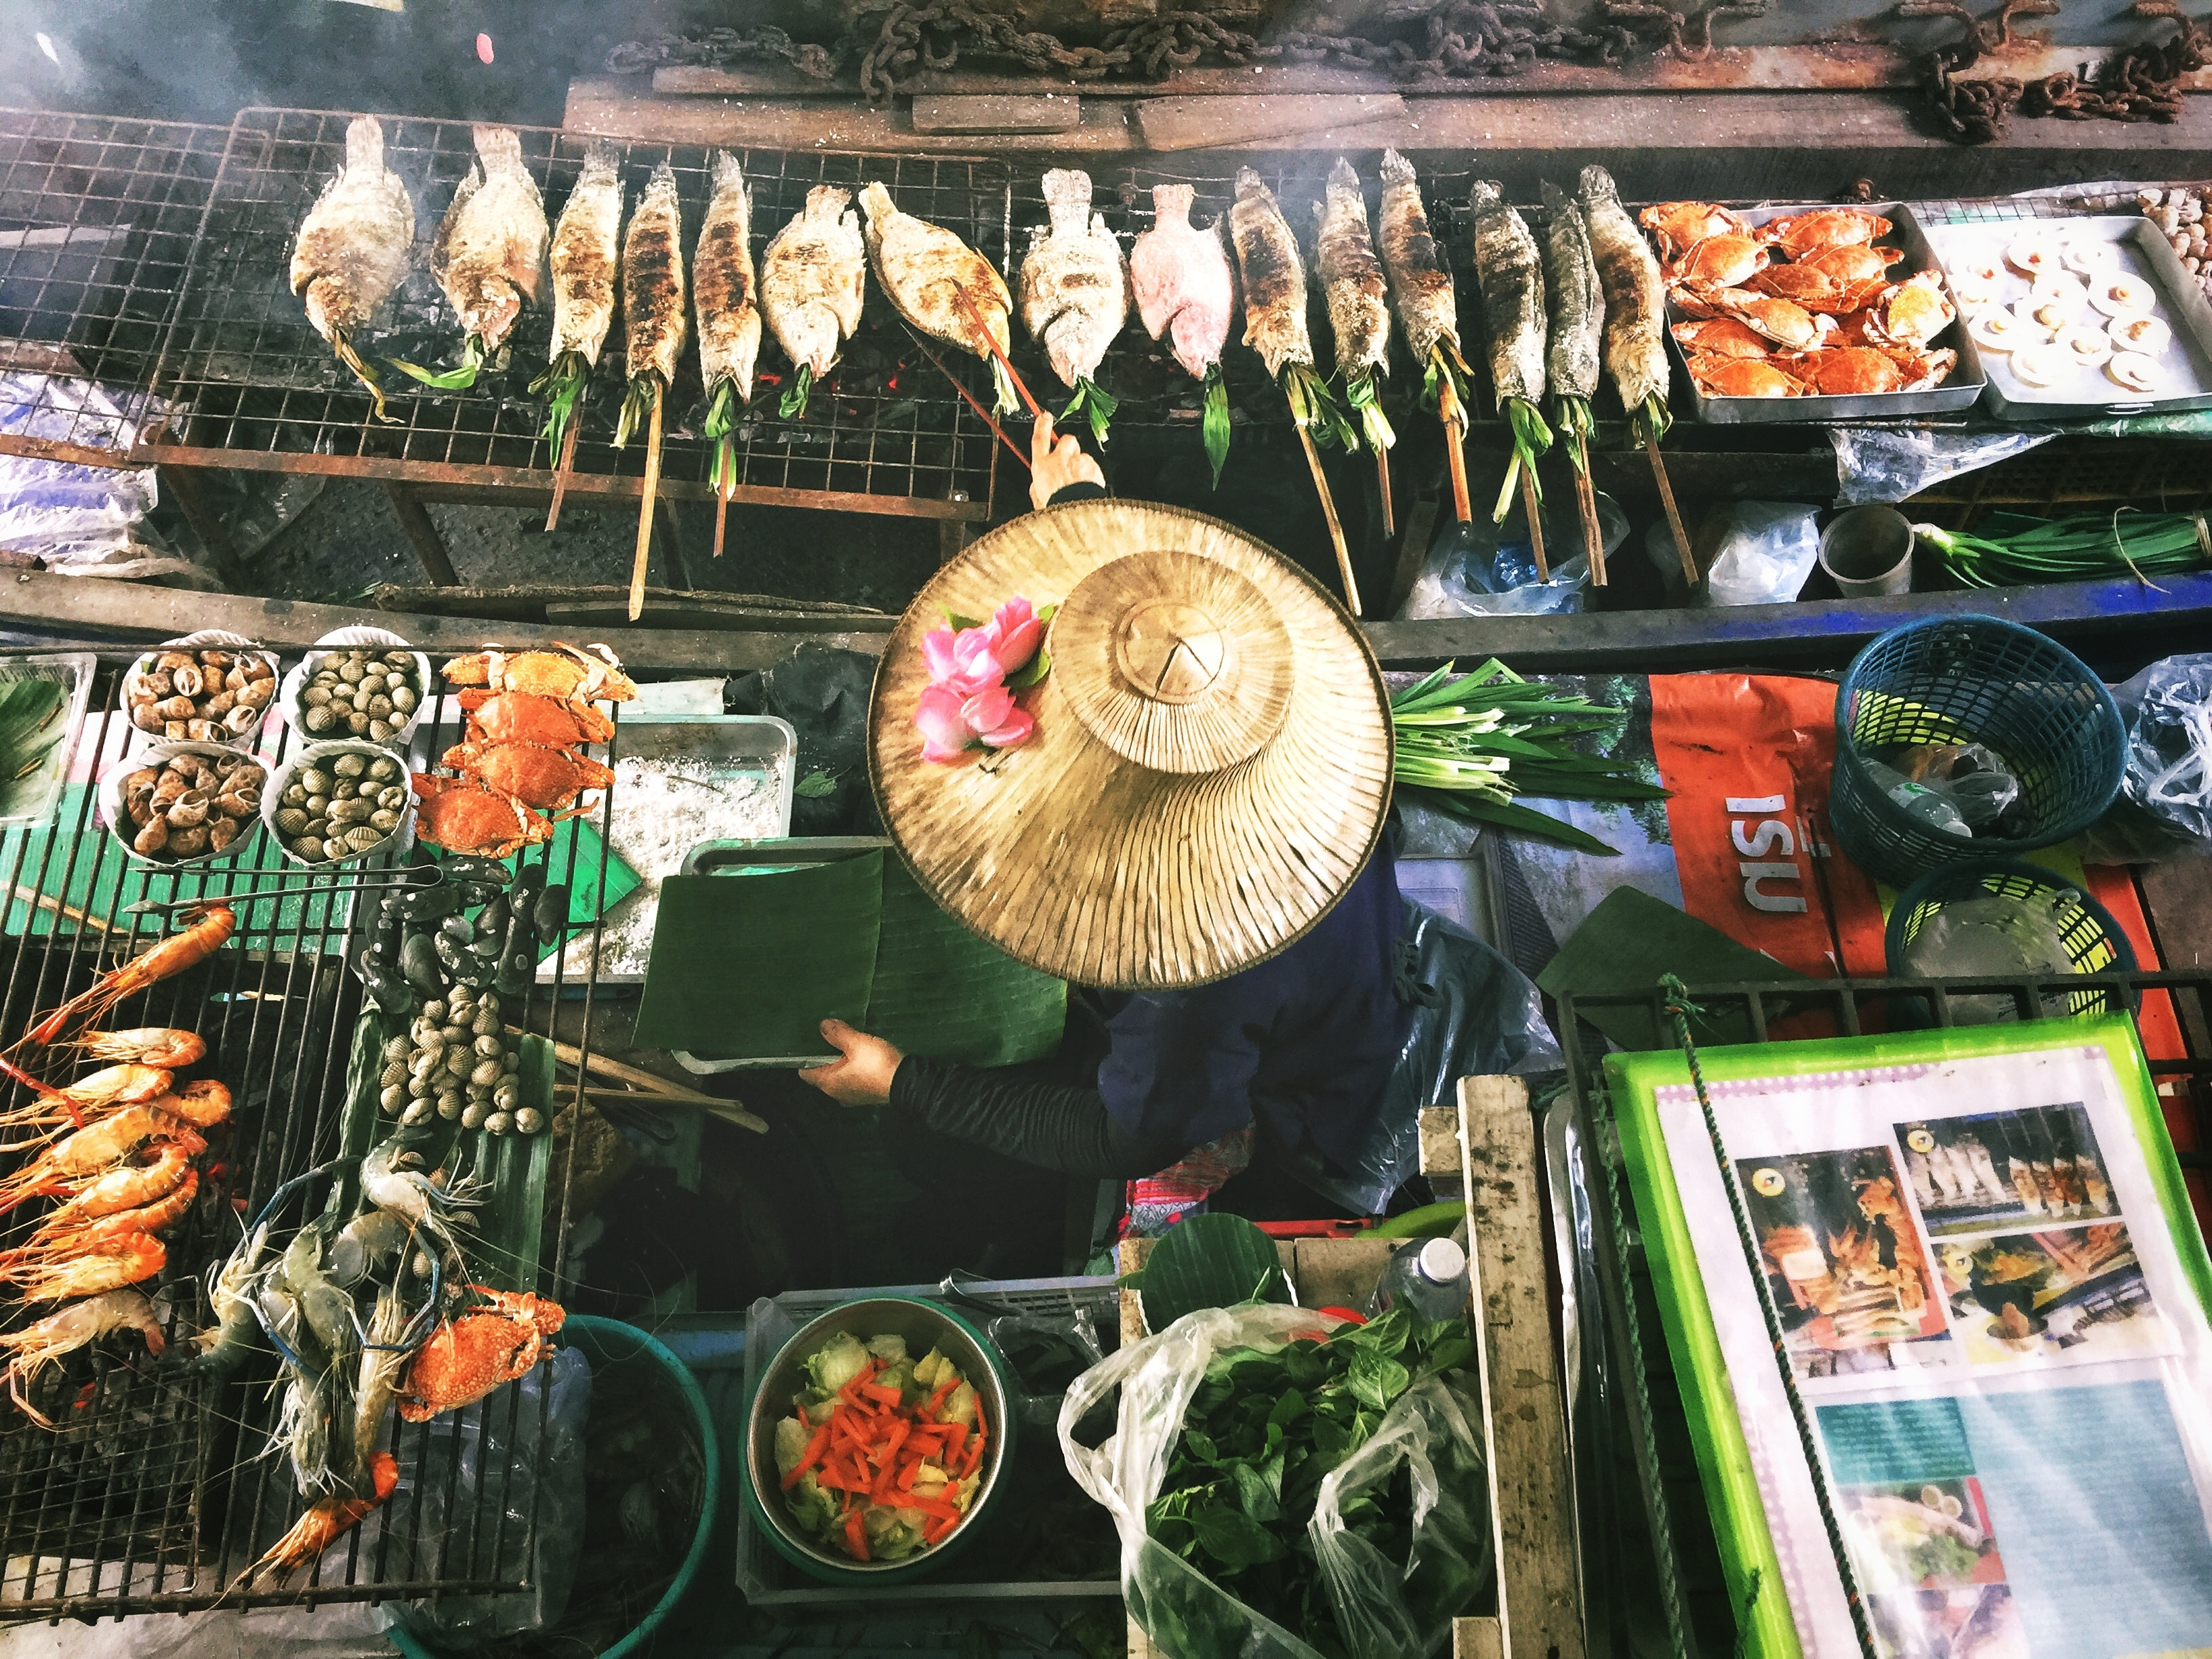 Street food in Thailand, Lisheng Chang on Unsplash